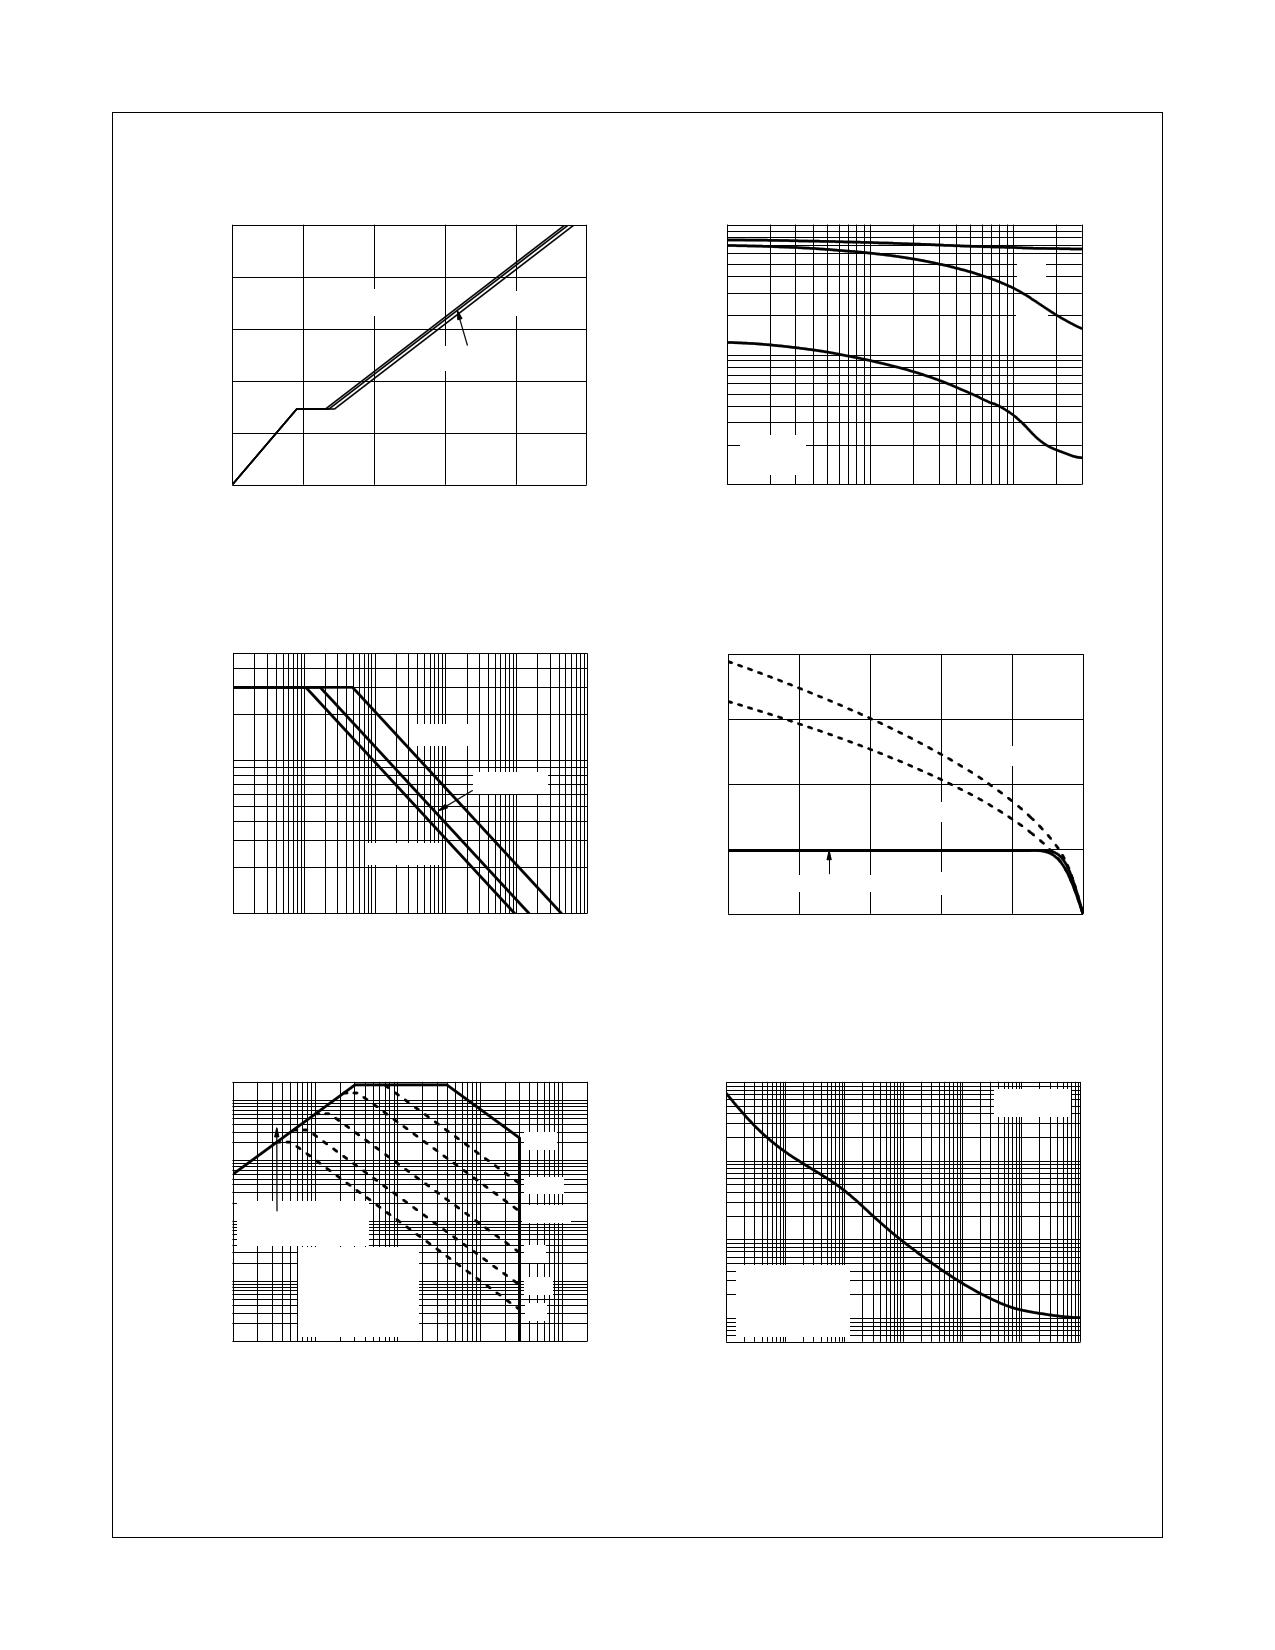 FDMS0300S pdf, 반도체, 판매, 대치품